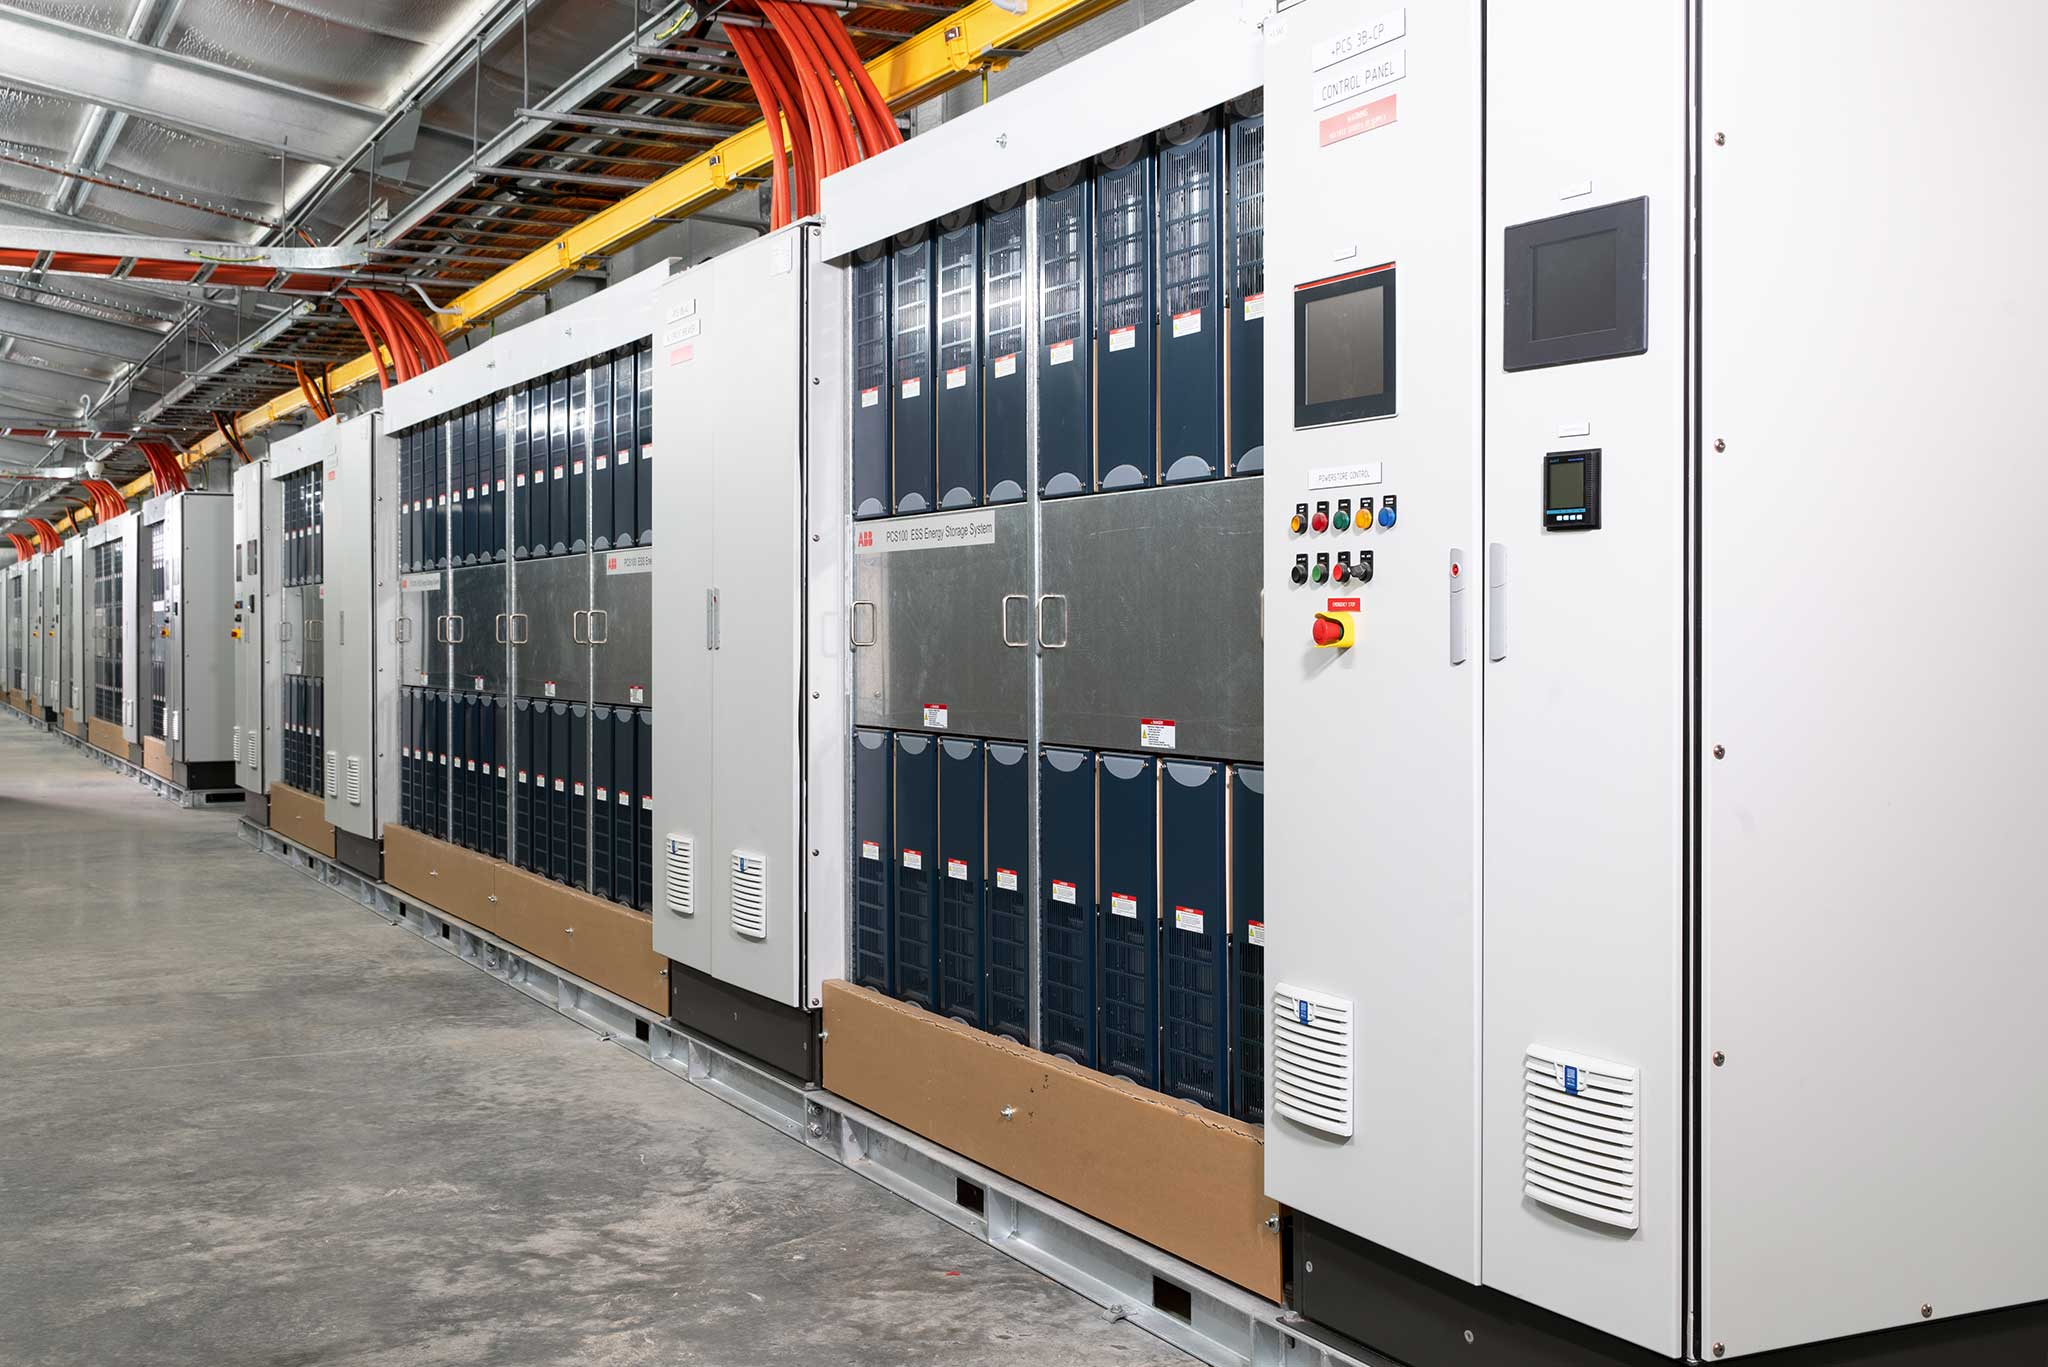 Image - Energy Storage for Commercial Renewable Integration (ESCRI) Phase 2